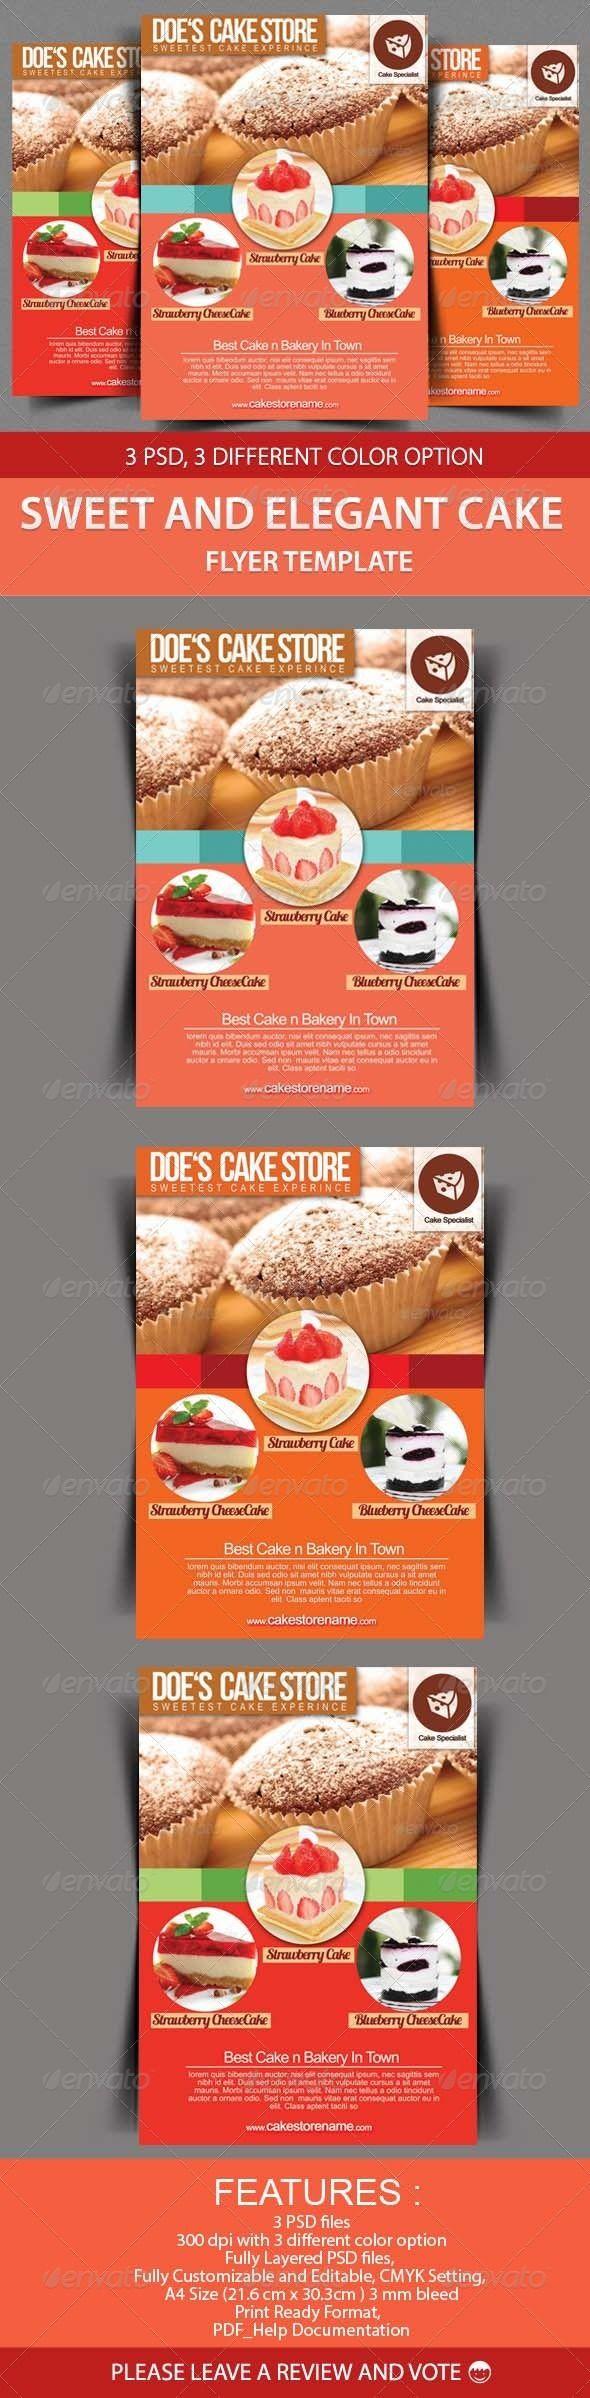 sweet and elegant cake flyer template brochure design pinterest